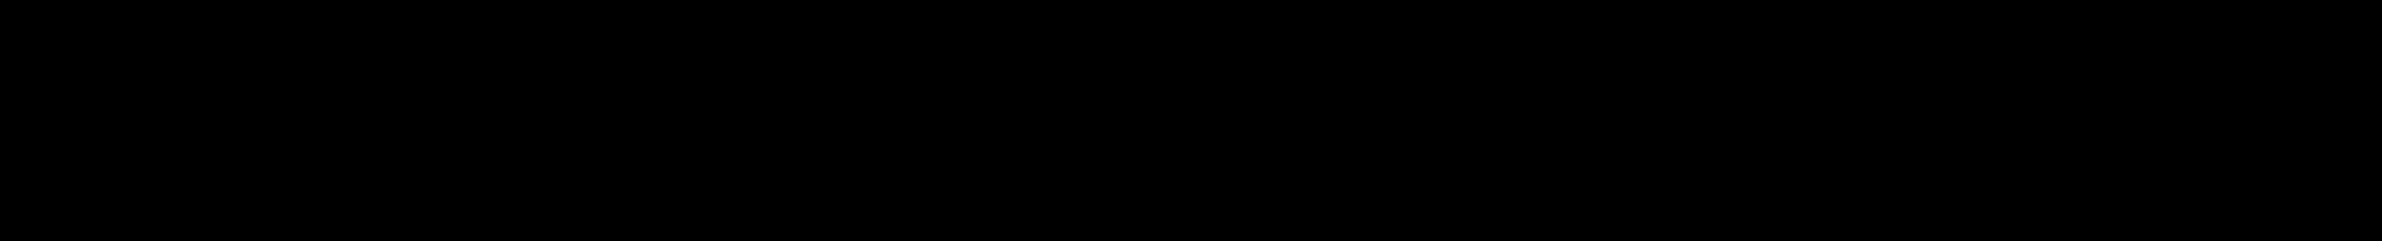 Museo Sans 700 Font – Museo Sans 700 ttf, otf, zip file download